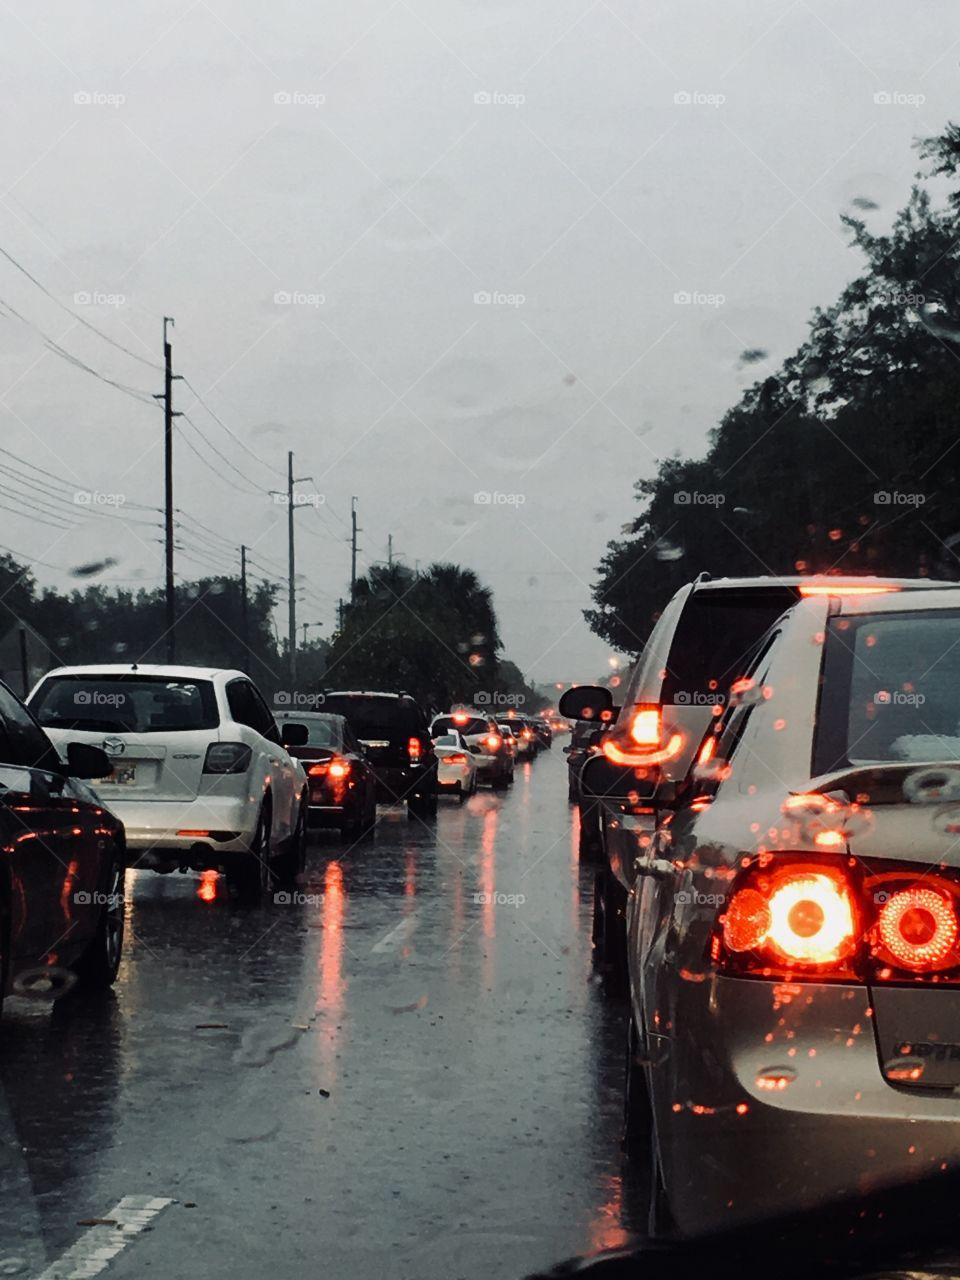 Traffic on a rainy road